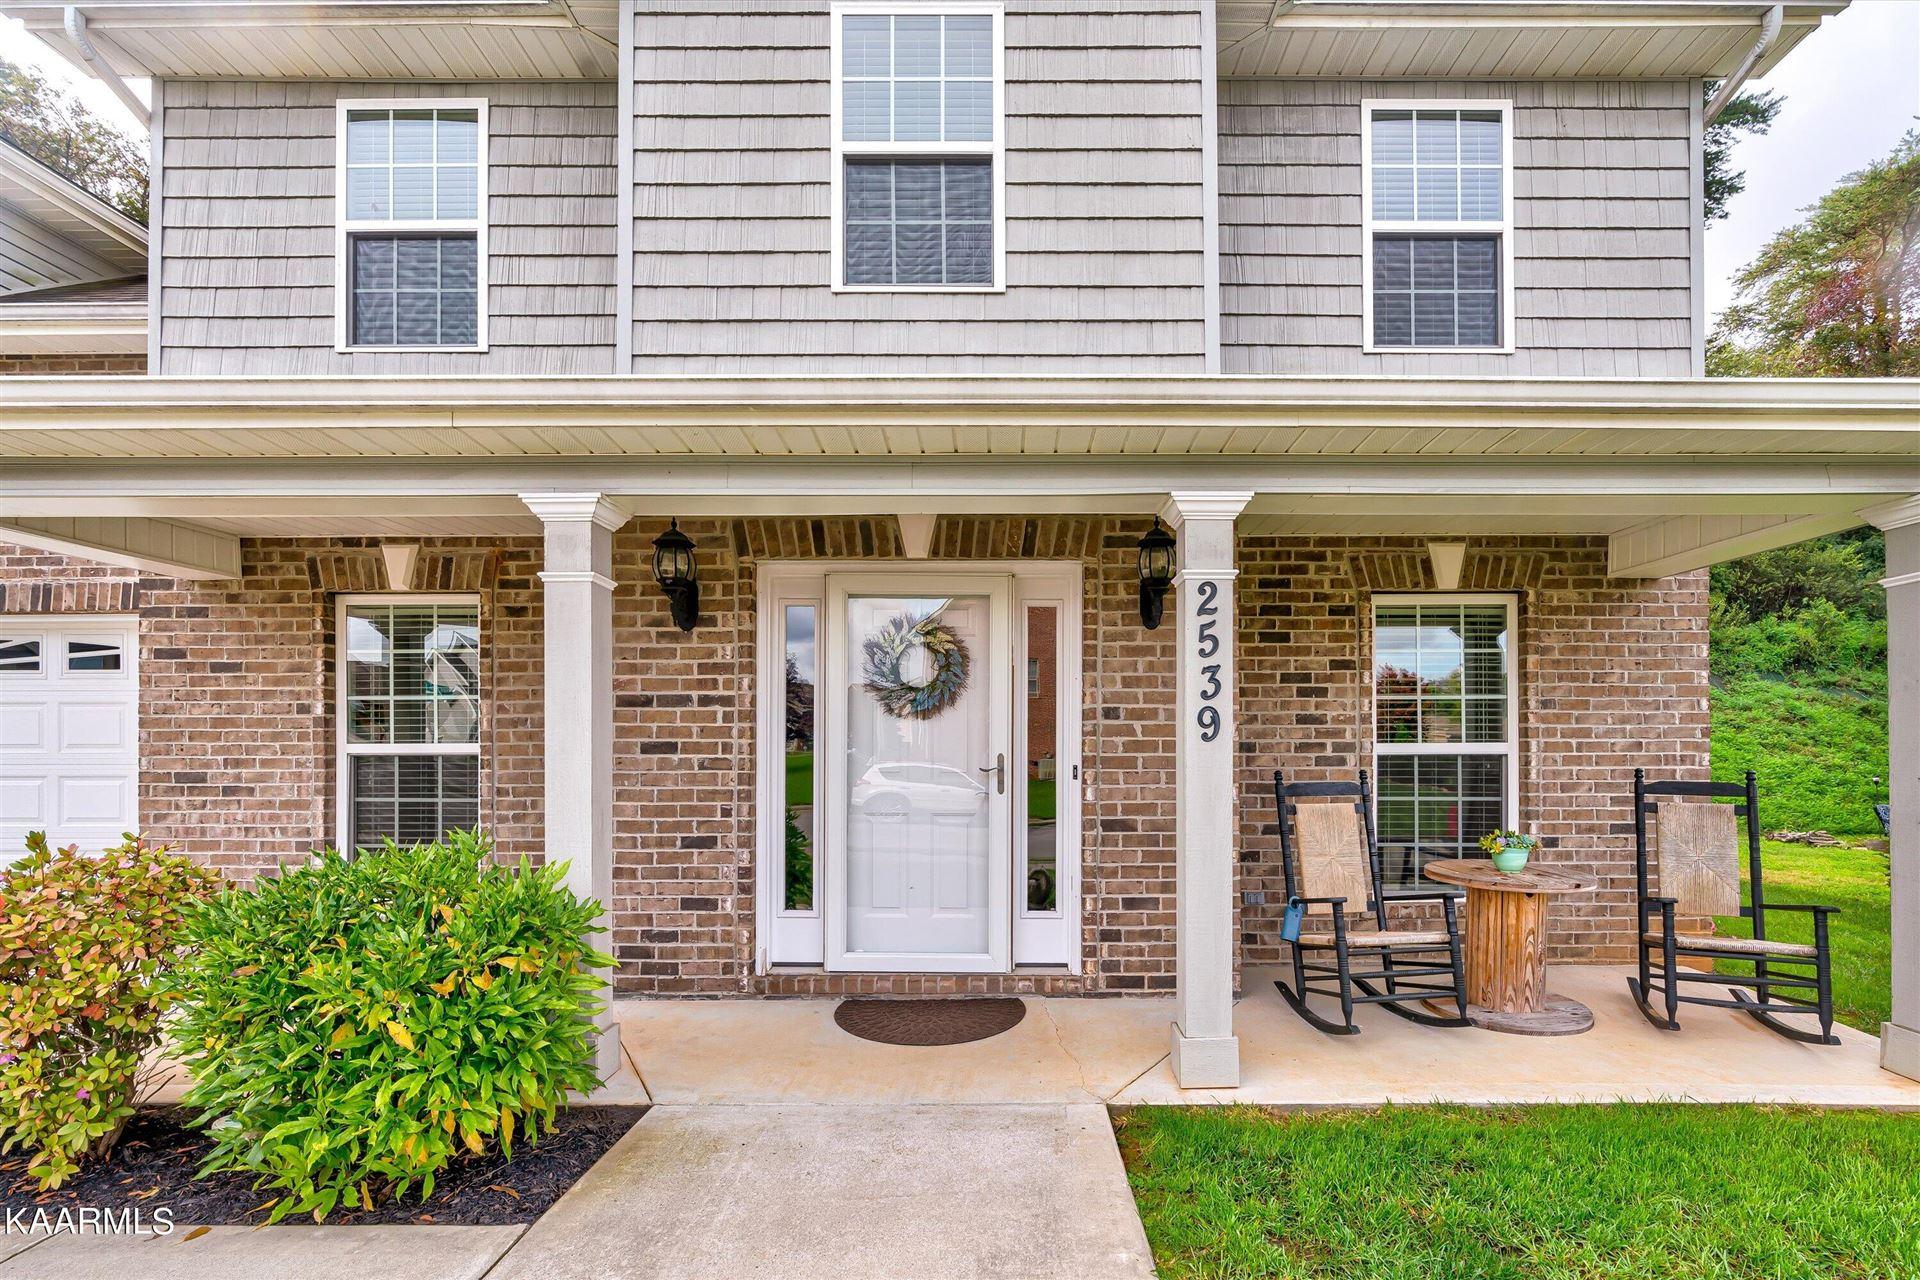 Photo of 2539 Brantley Park Blvd, Maryville, TN 37804 (MLS # 1165790)